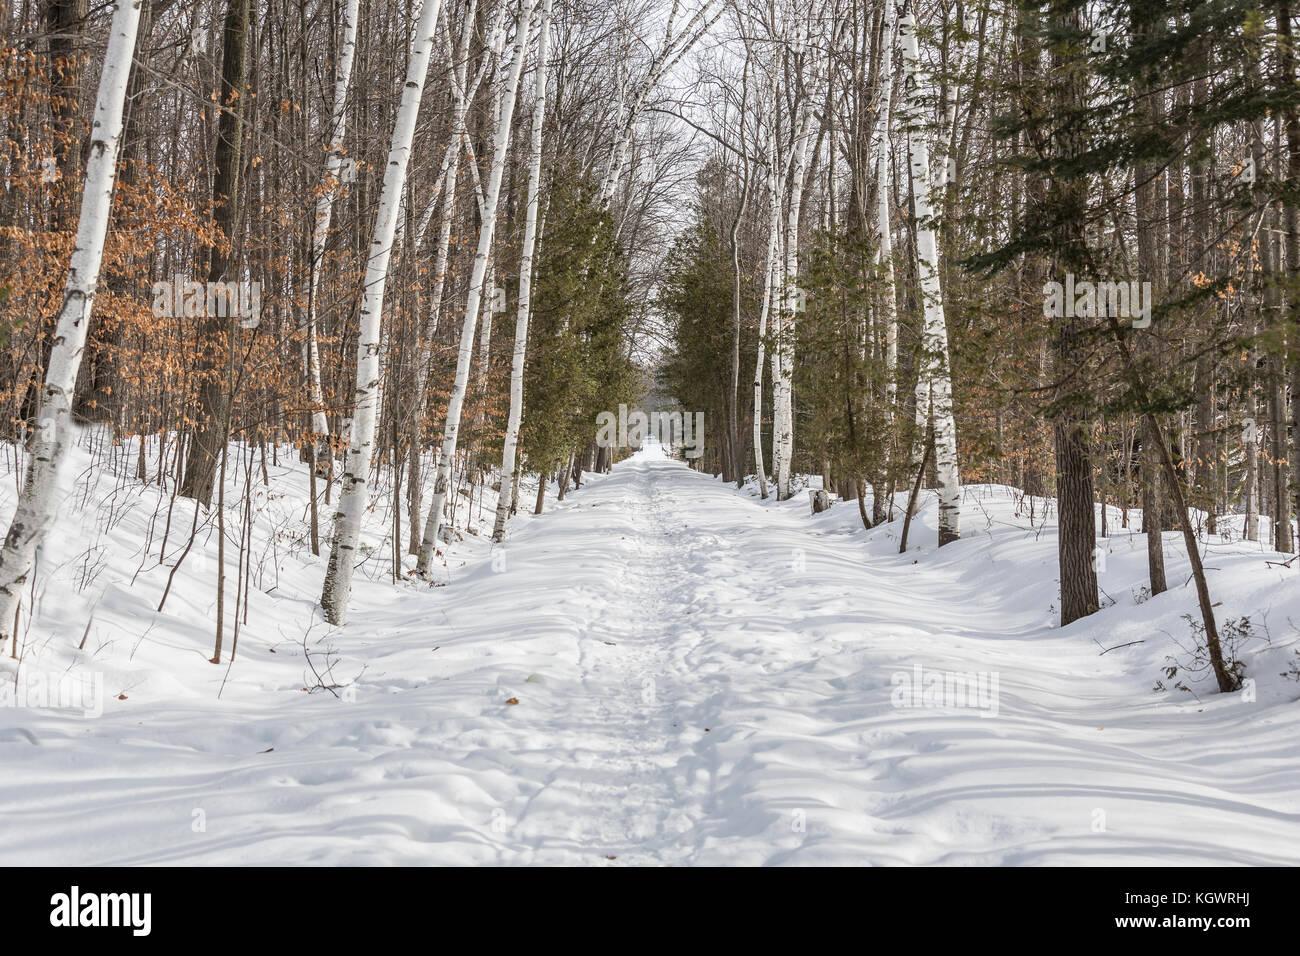 Canadian winter scene - Stock Image